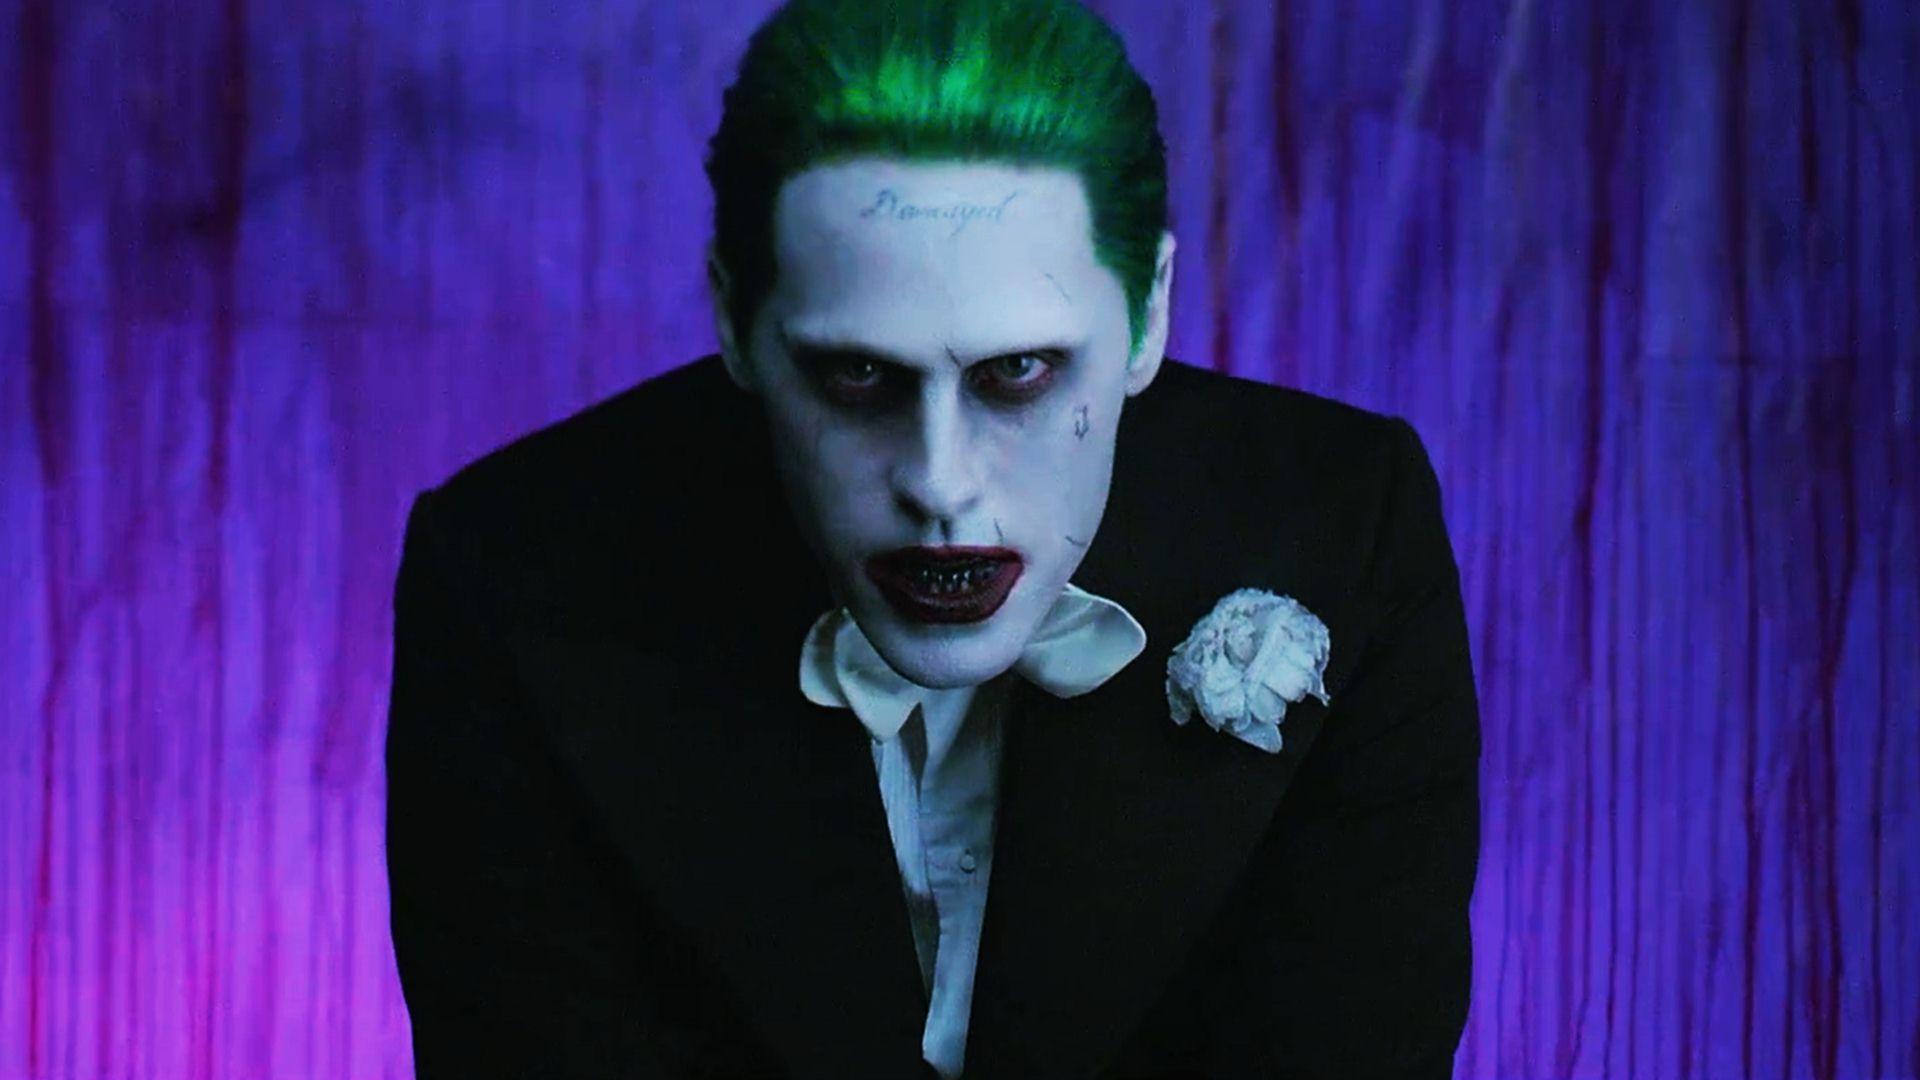 Joker Suicide Squad 4k Wallpapers Top Free Joker Suicide Squad